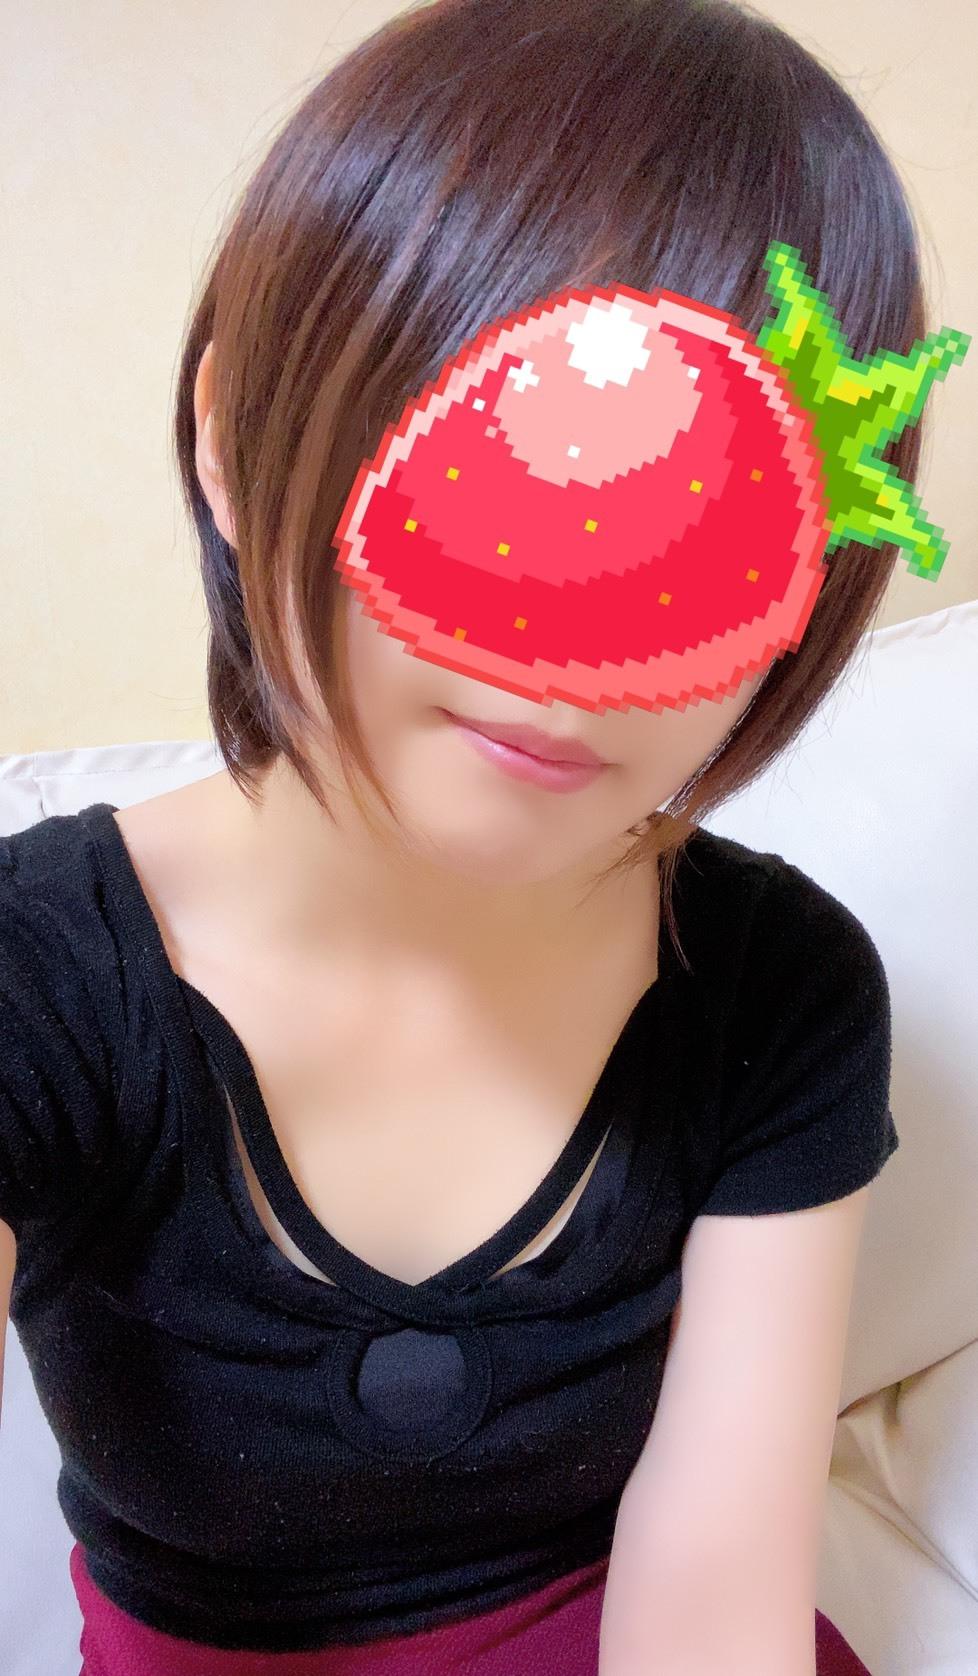 S__132186114.jpg